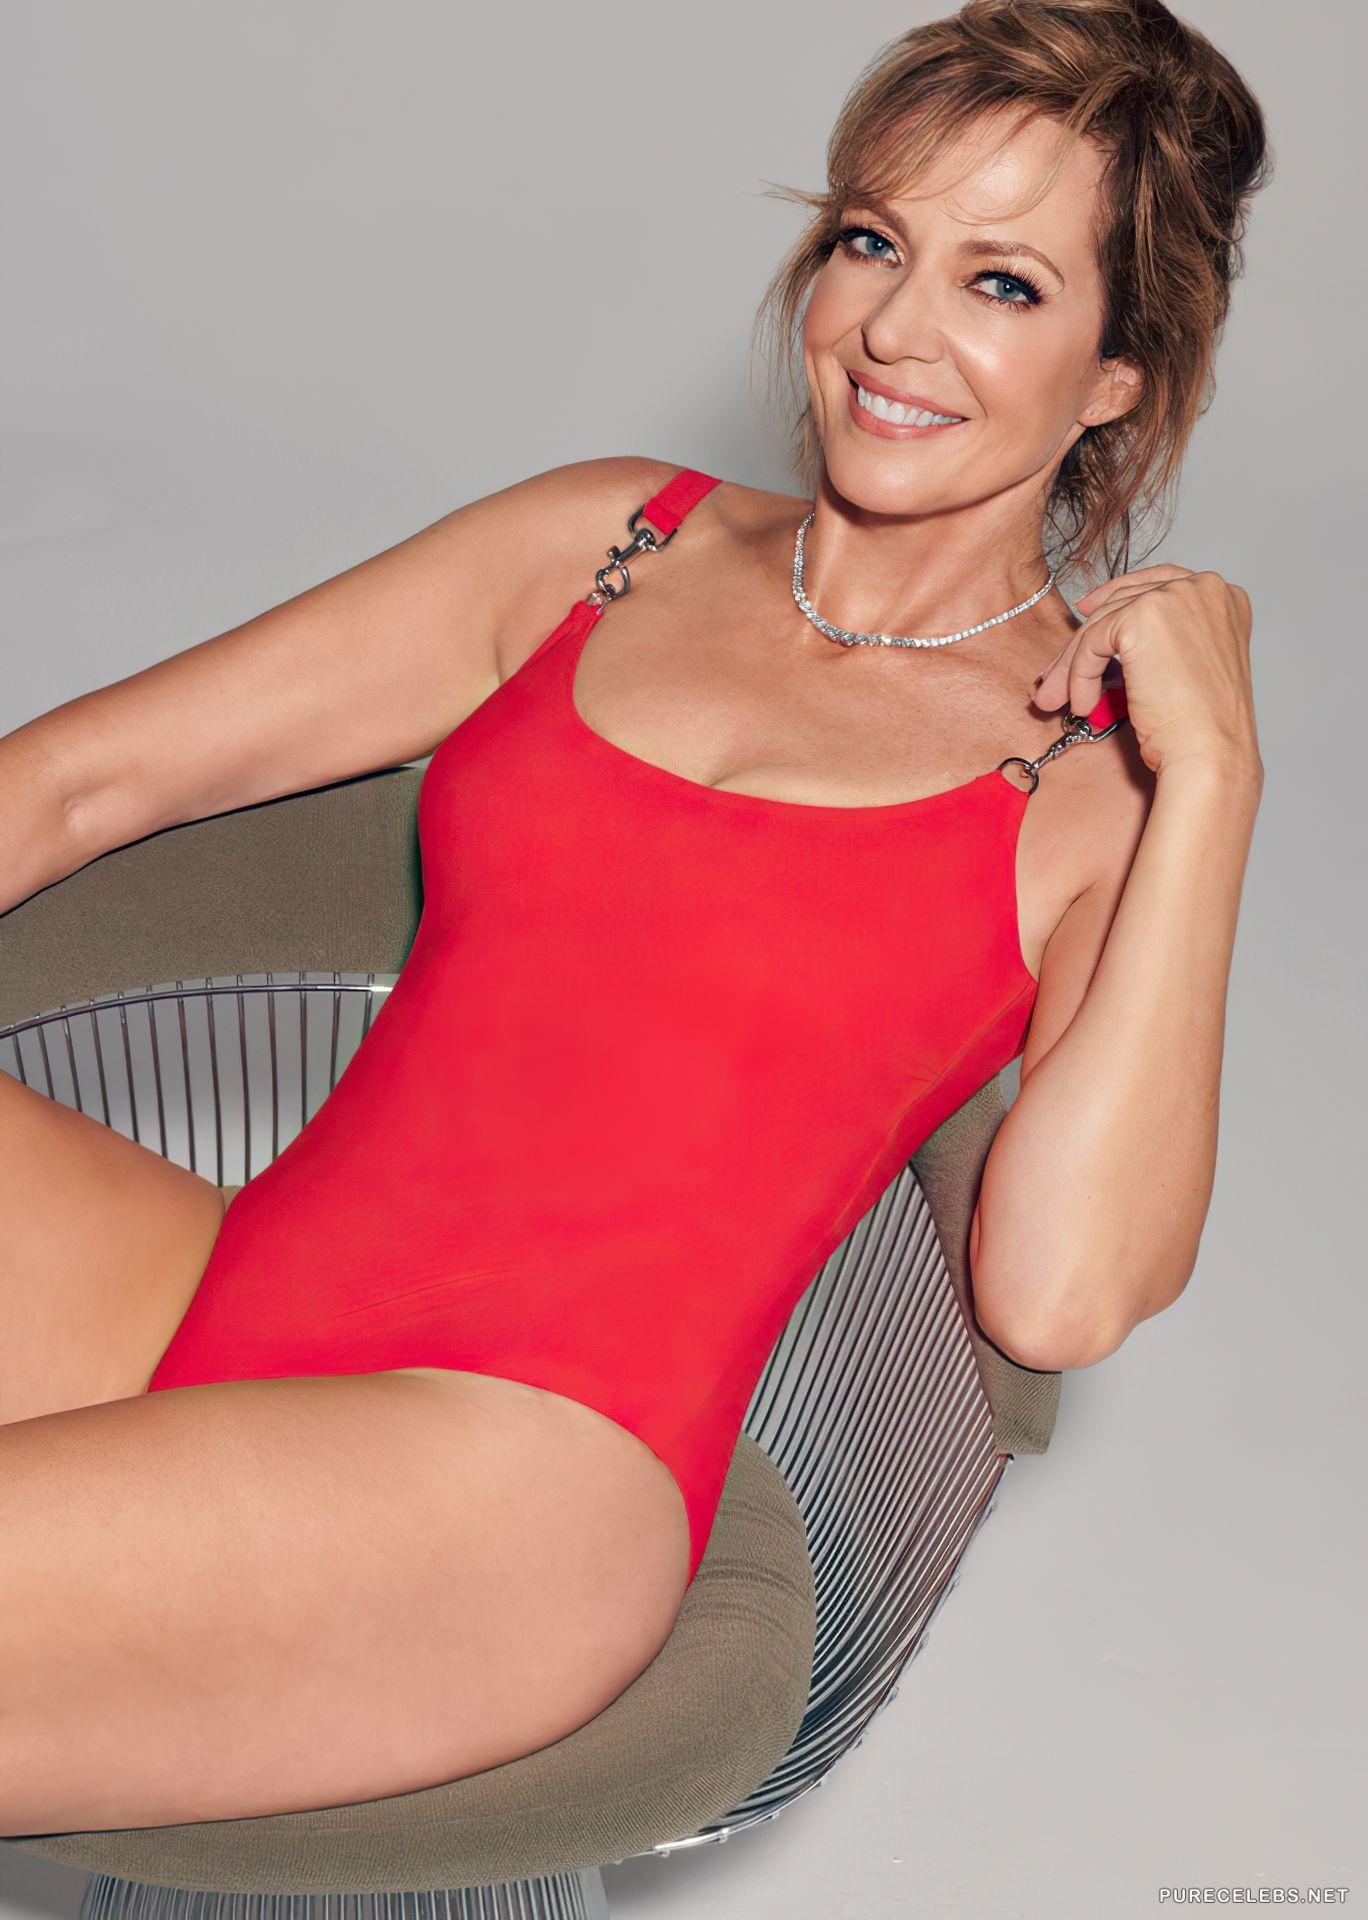 Allison Janney Nude. Allison Janney Bikini - The Welcoming